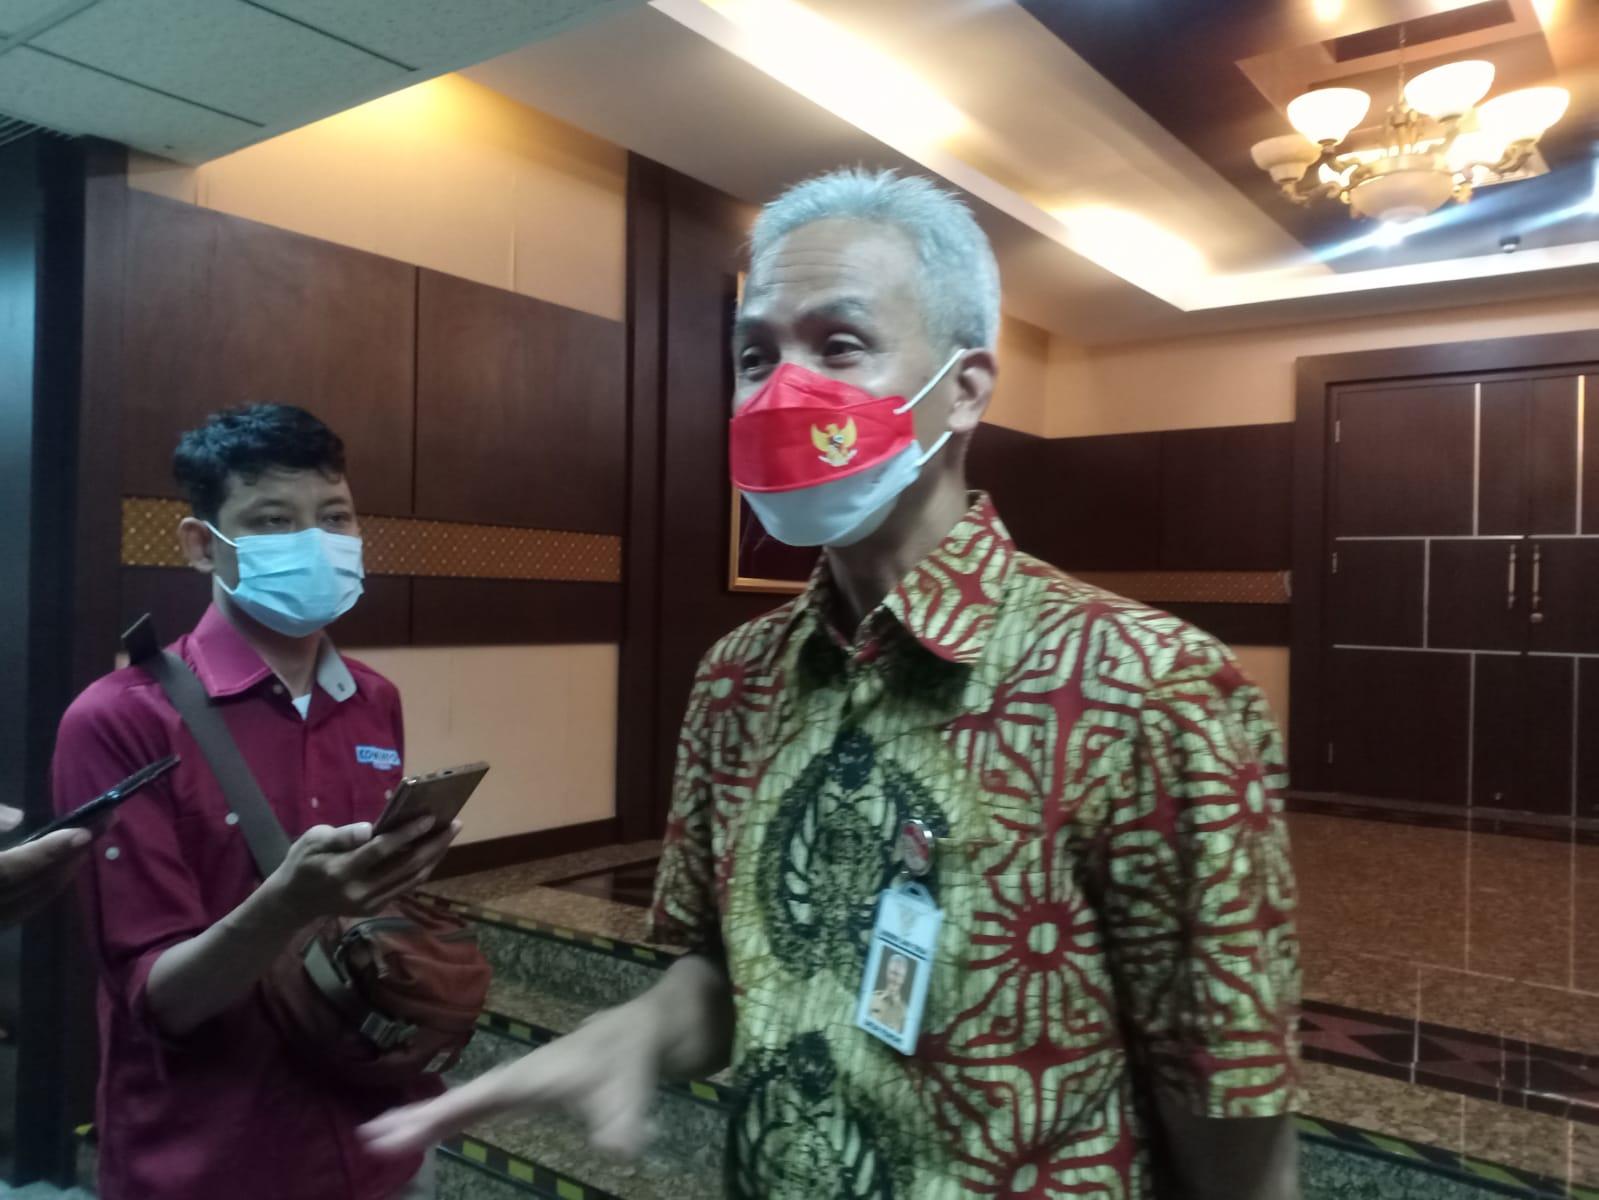 Gubernur Jateng, Ganjar Pranowo usai melakukan rapat penanganan Covid-19, kemarin. Rezanda Akbar D/Lingkar.co